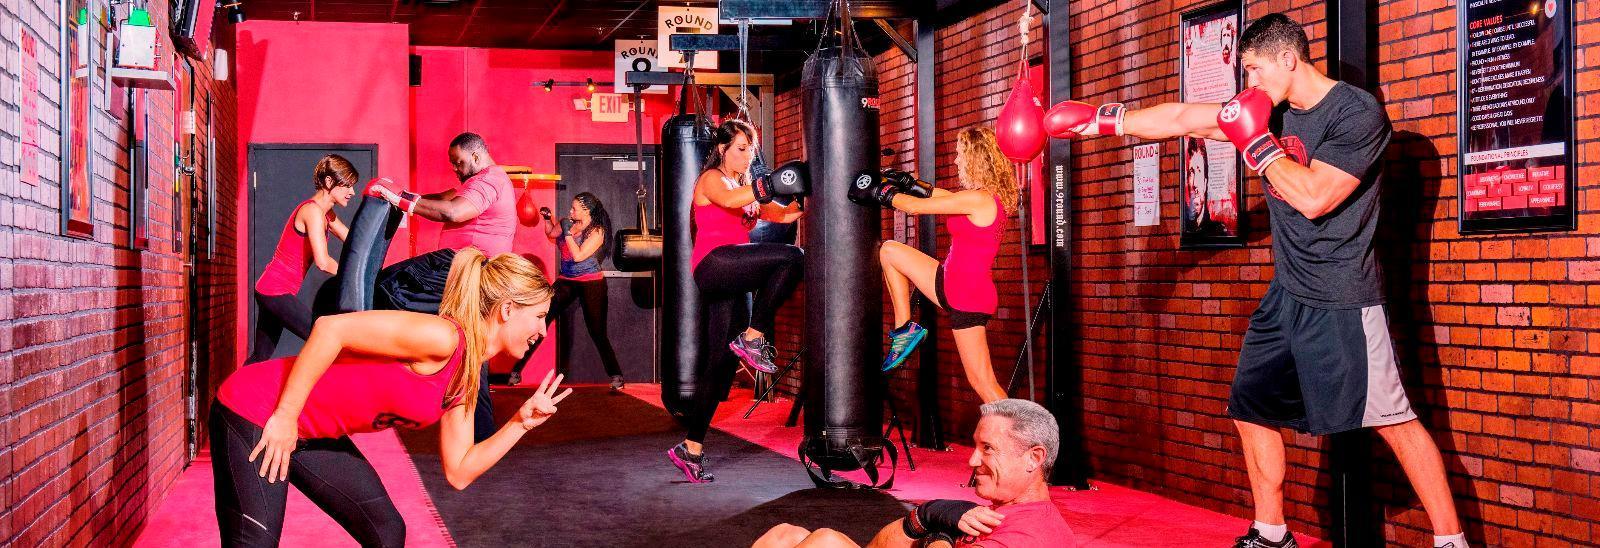 9Round 30 Min Kickbox Fitness banner image - Bonney Lake - Puyallup - Renton